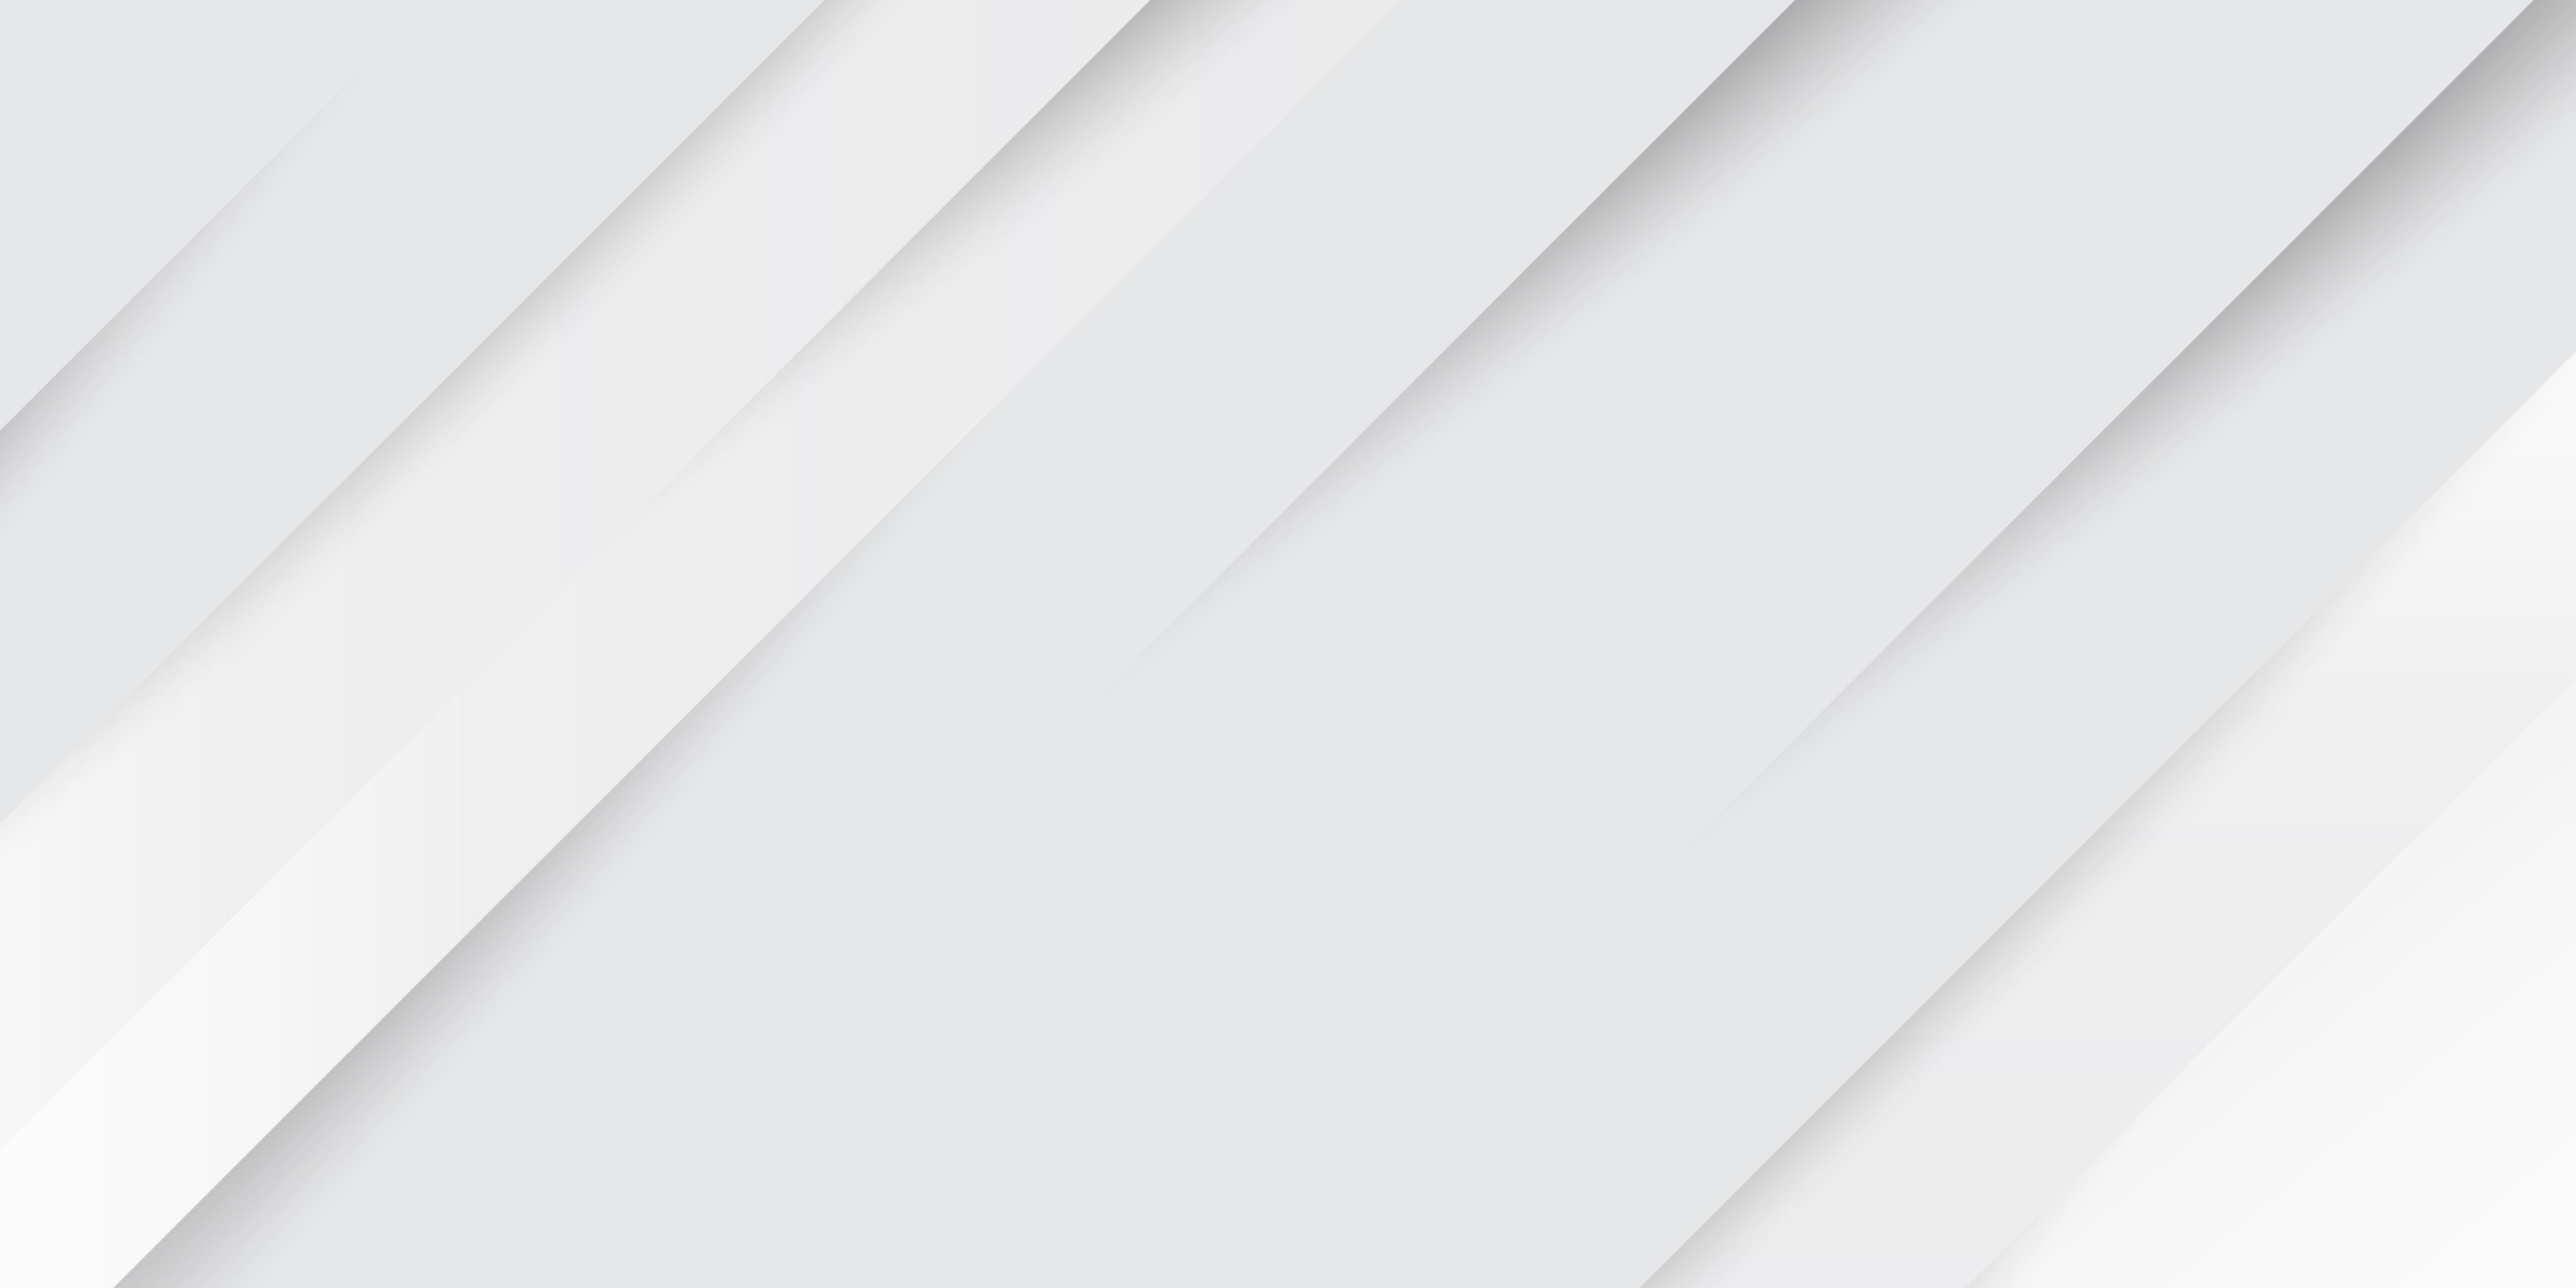 KraneShares and FederatedHermes Webinar Banner